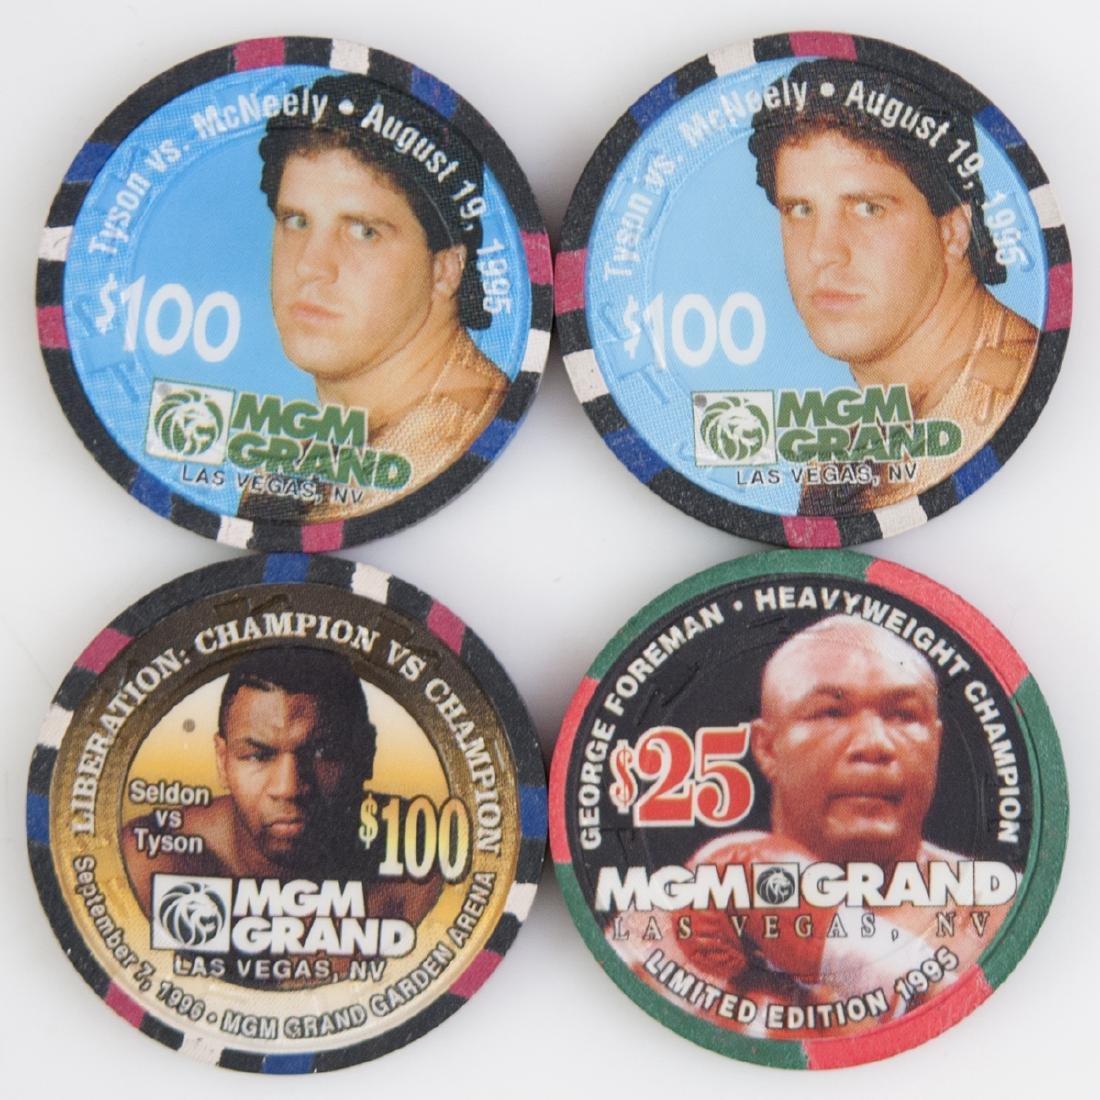 MGM Grand Casino Chips - 2